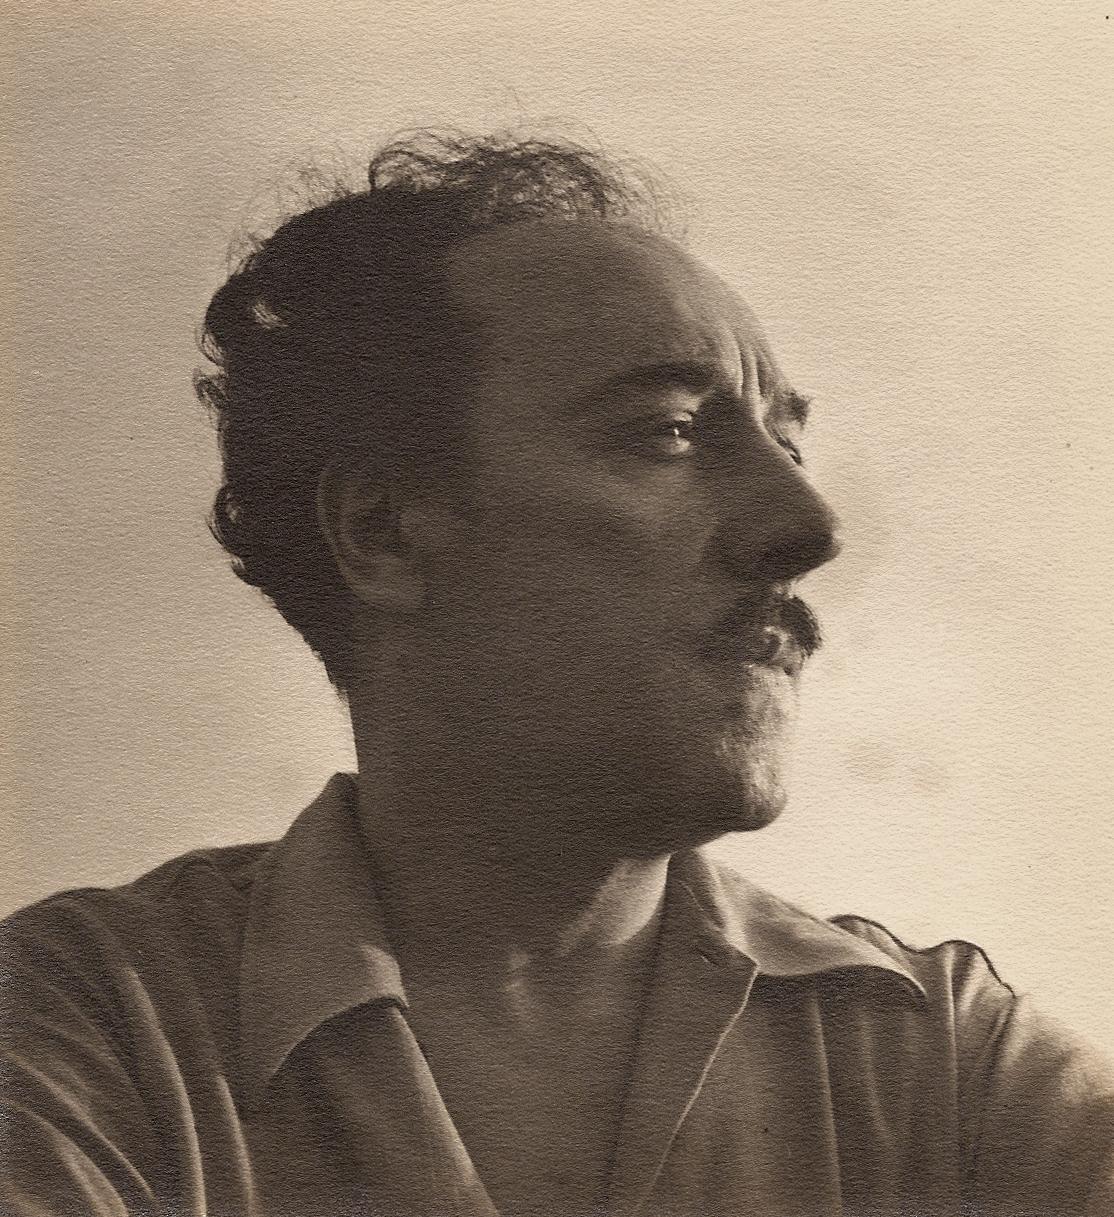 BORISLAV BOGDANOVICH 1899 - 1970